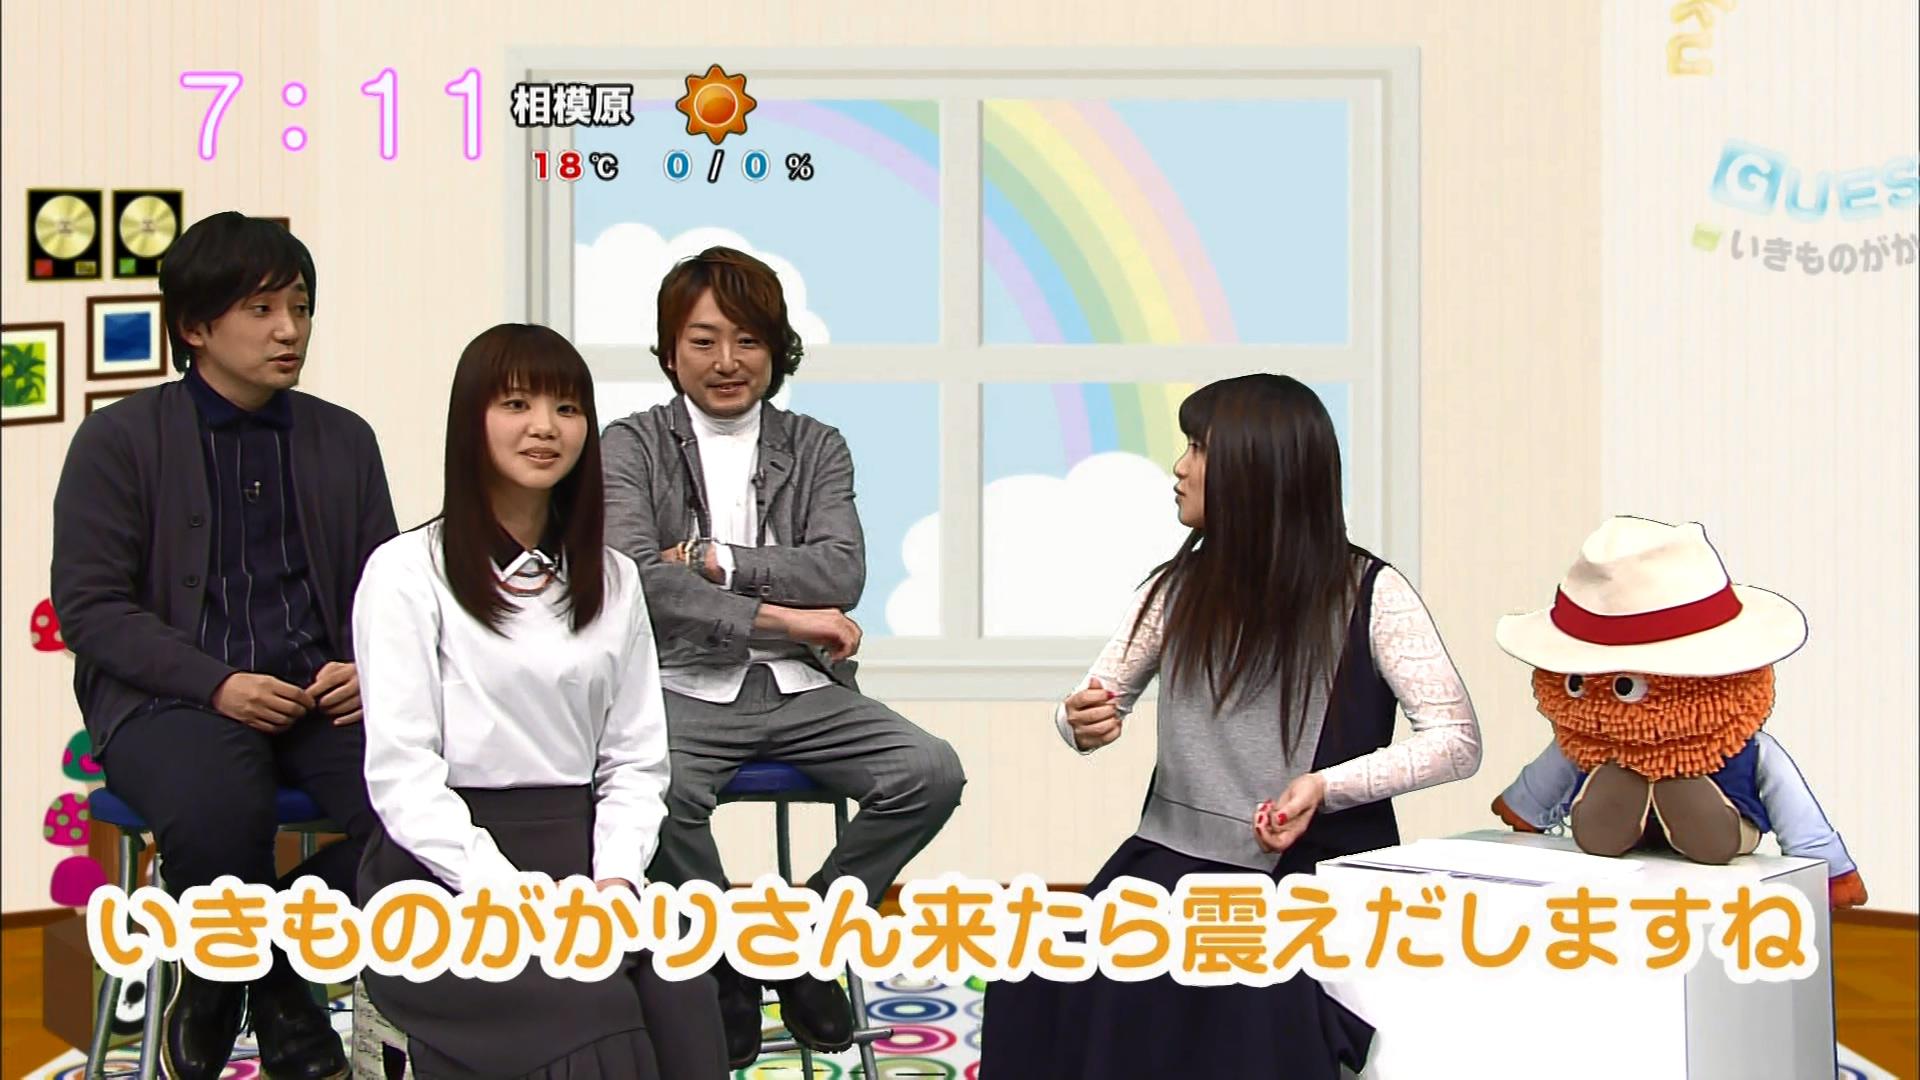 2016.03.17 いきものがかり(saku saku).ts_20160317_081234.616